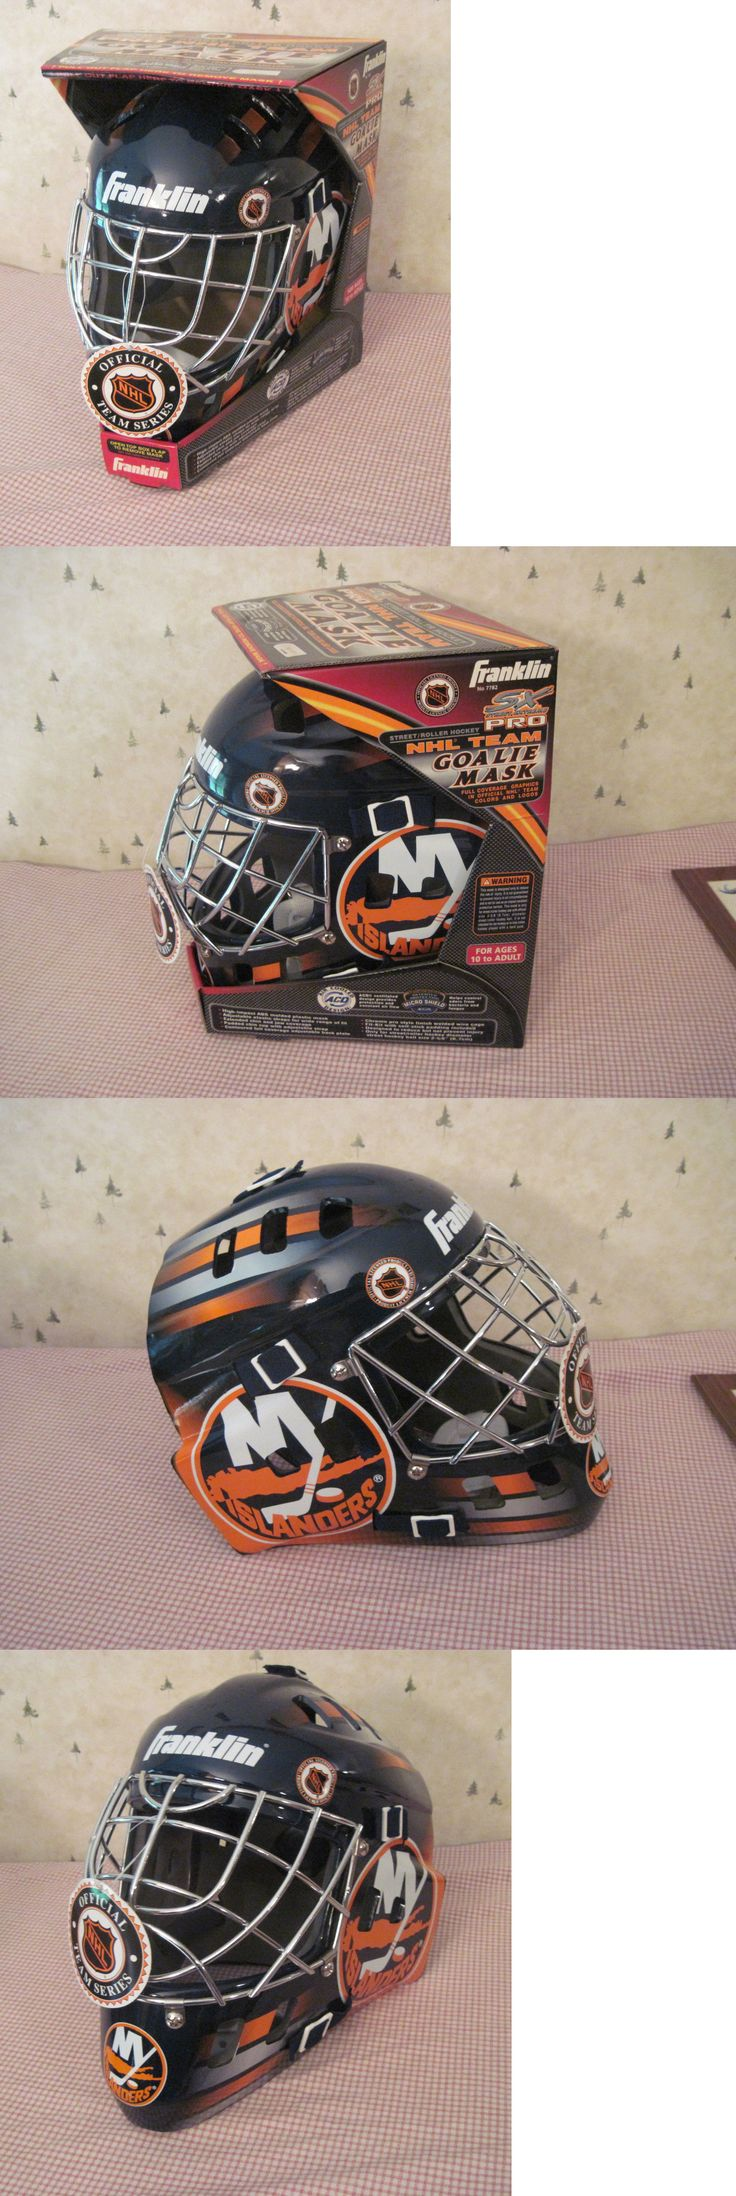 Face Masks 79762: Vintage New York Islanders Franklin Sx Pro Full Size Goalie Mask - New BUY IT NOW ONLY: $59.49